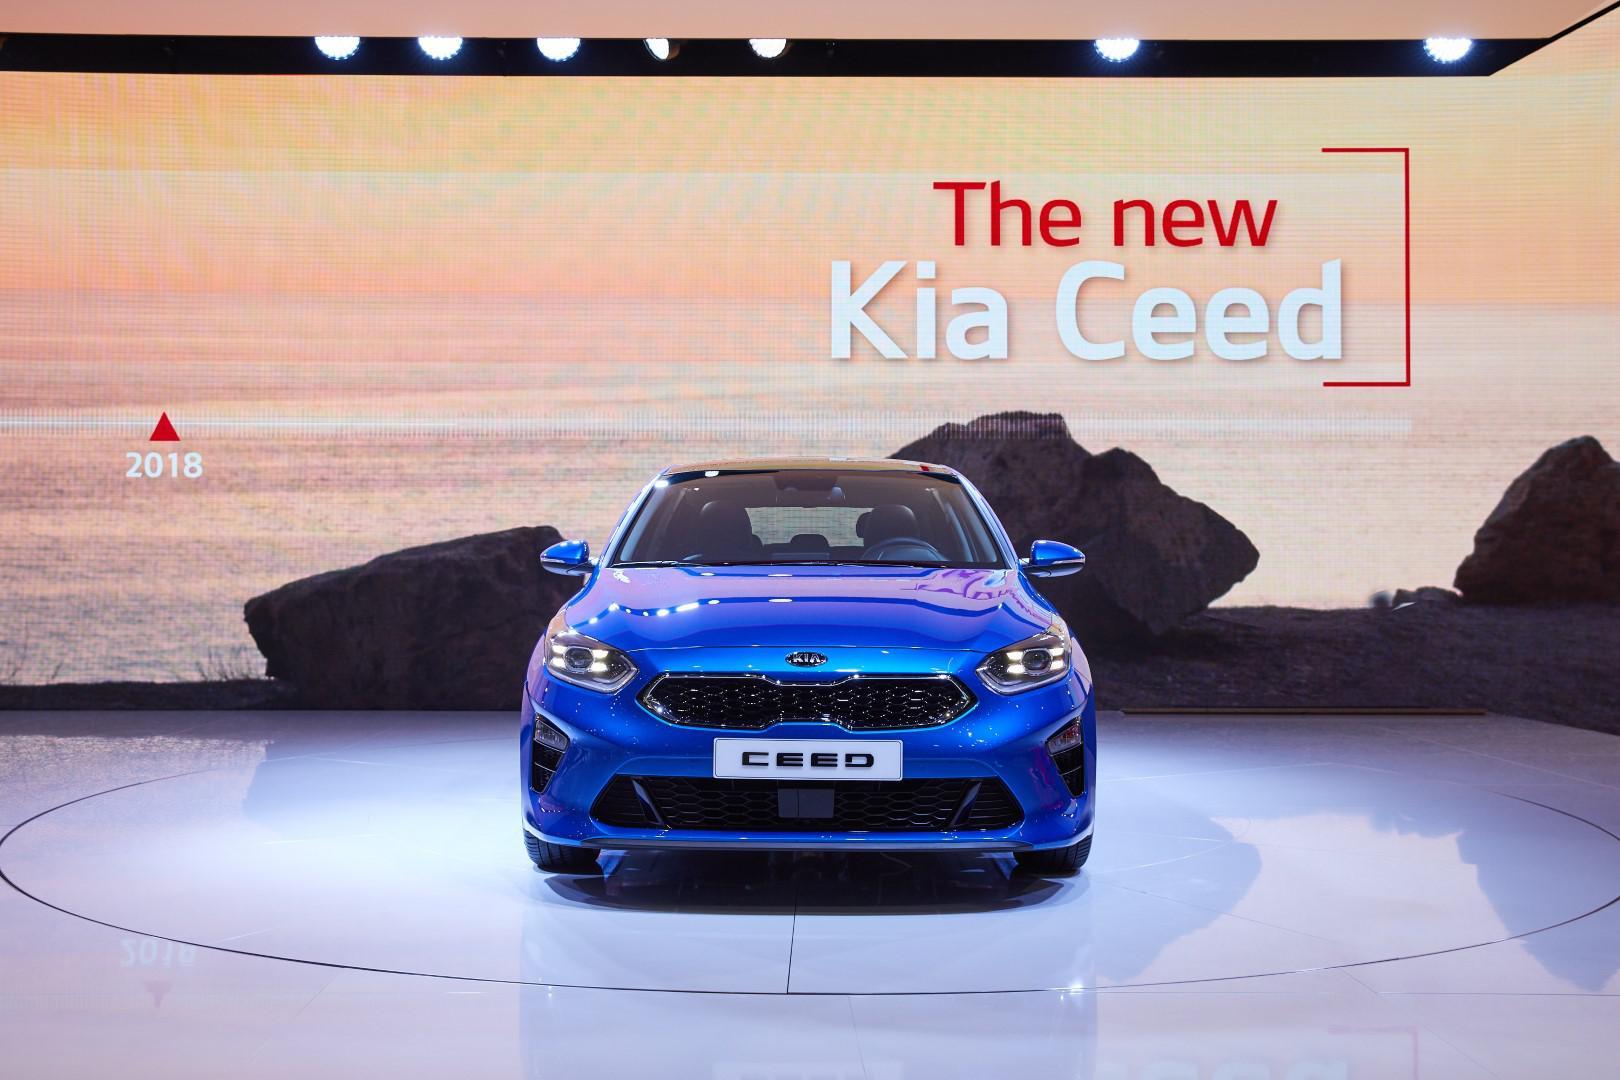 la-nouvelle-et-innovante-kia-ceed-made-in-europe-fait-ses-debuts-au-maroc-1094-3.jpg